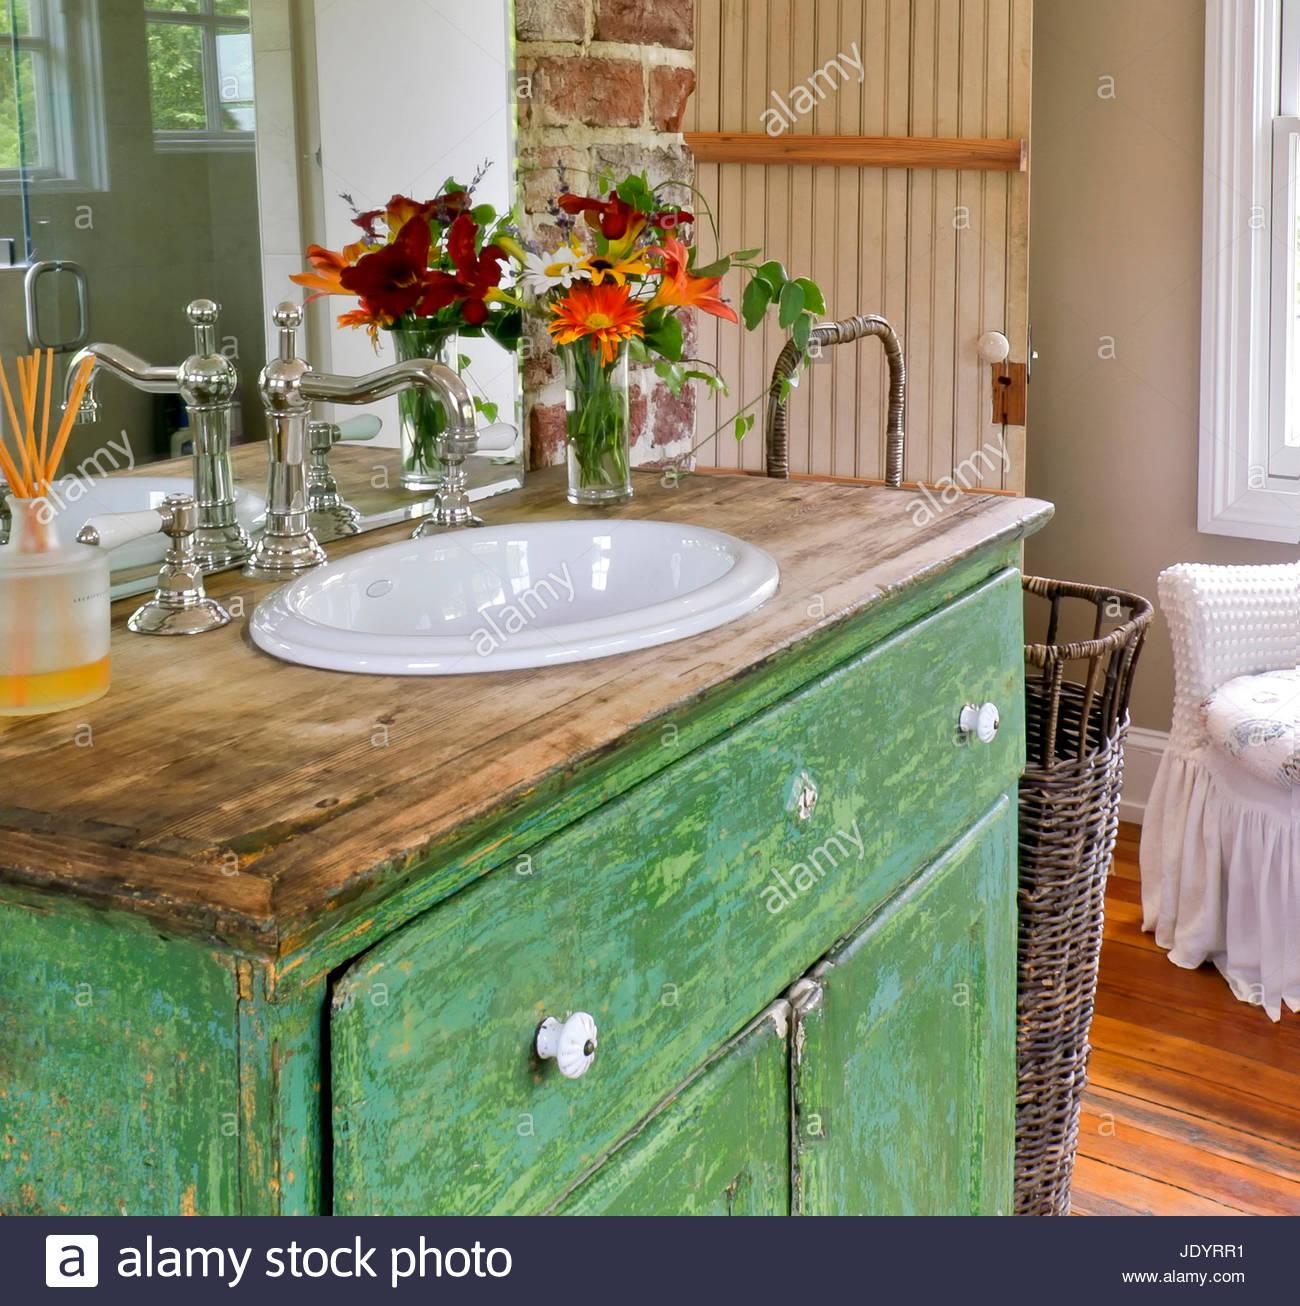 Stock Photo - Vintage Style Bathroom, Rustic Green Dresser Turned Vanity